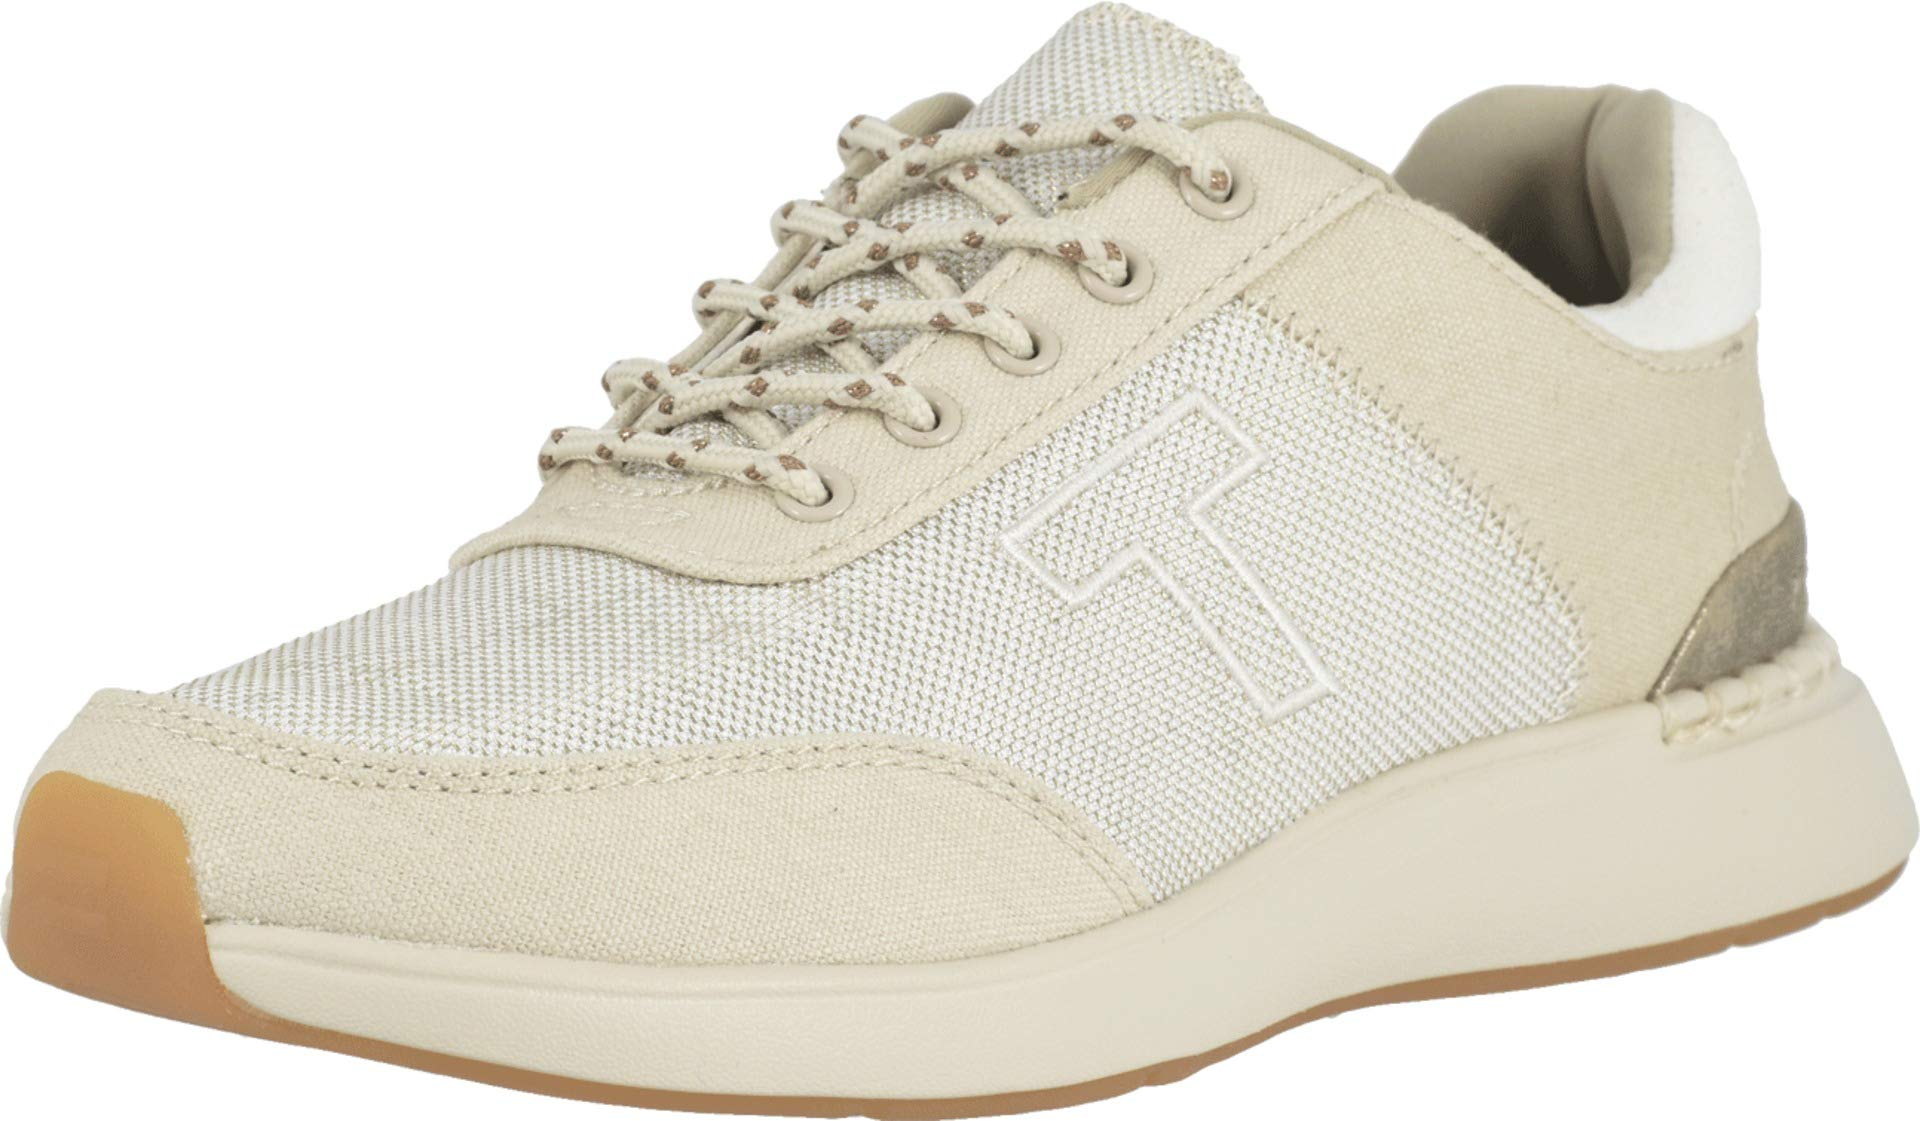 TOMS Men's Berkeley Slippers Forest Wool 10010897 Size 9